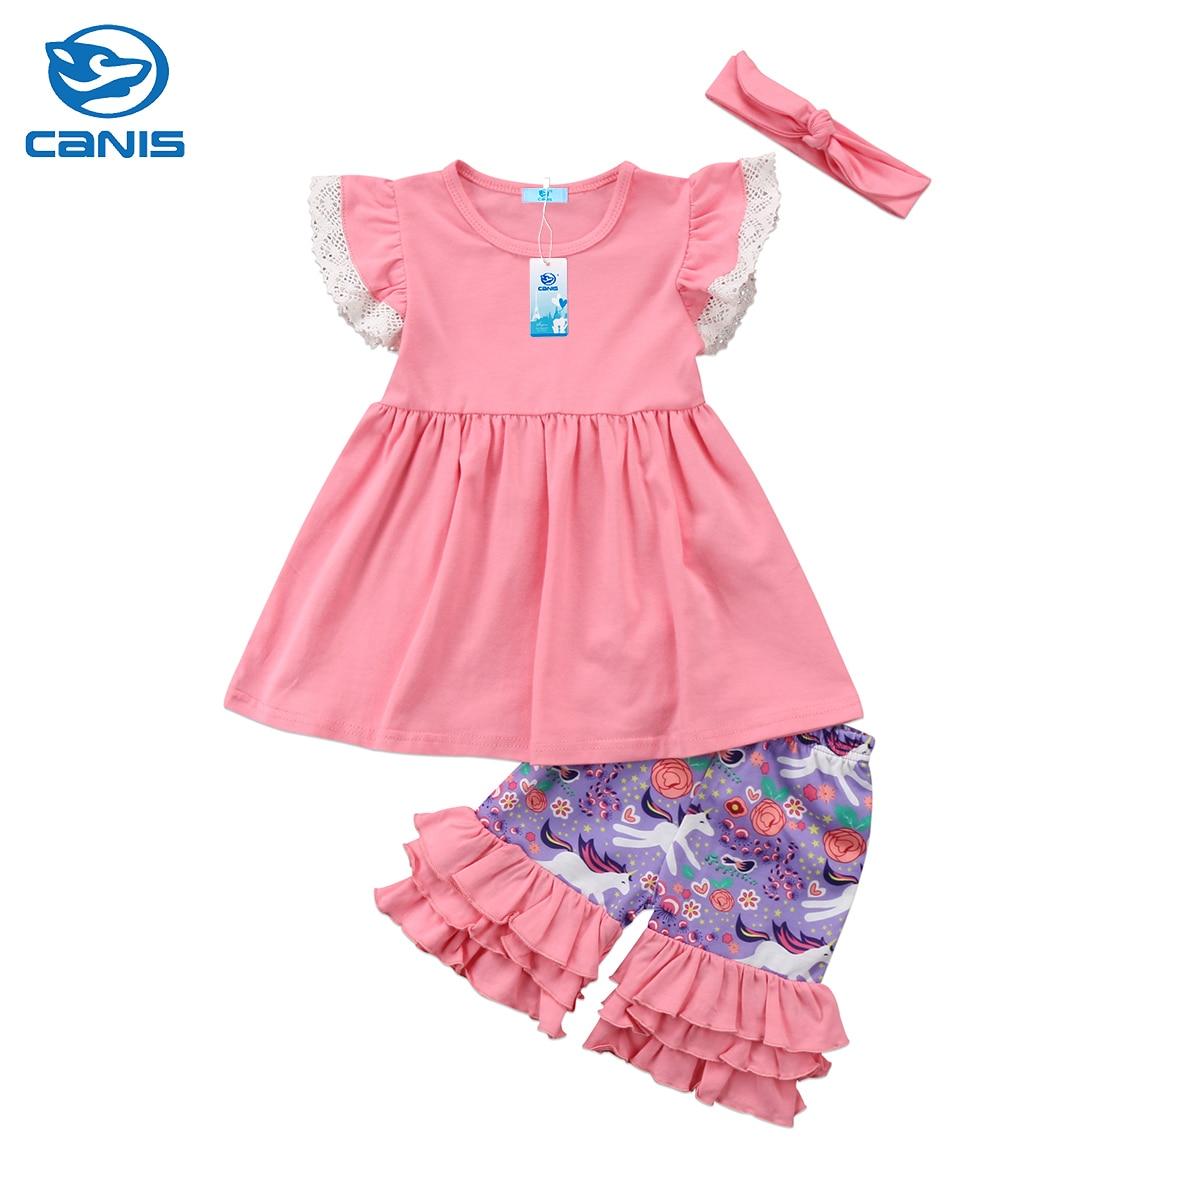 2018 Brand New Toddler Infant Child Kids Girls Lace Tops Dress Unicorn Shorts Headband 3Pcs Cartoon Outfits Set Ruffled Clothes